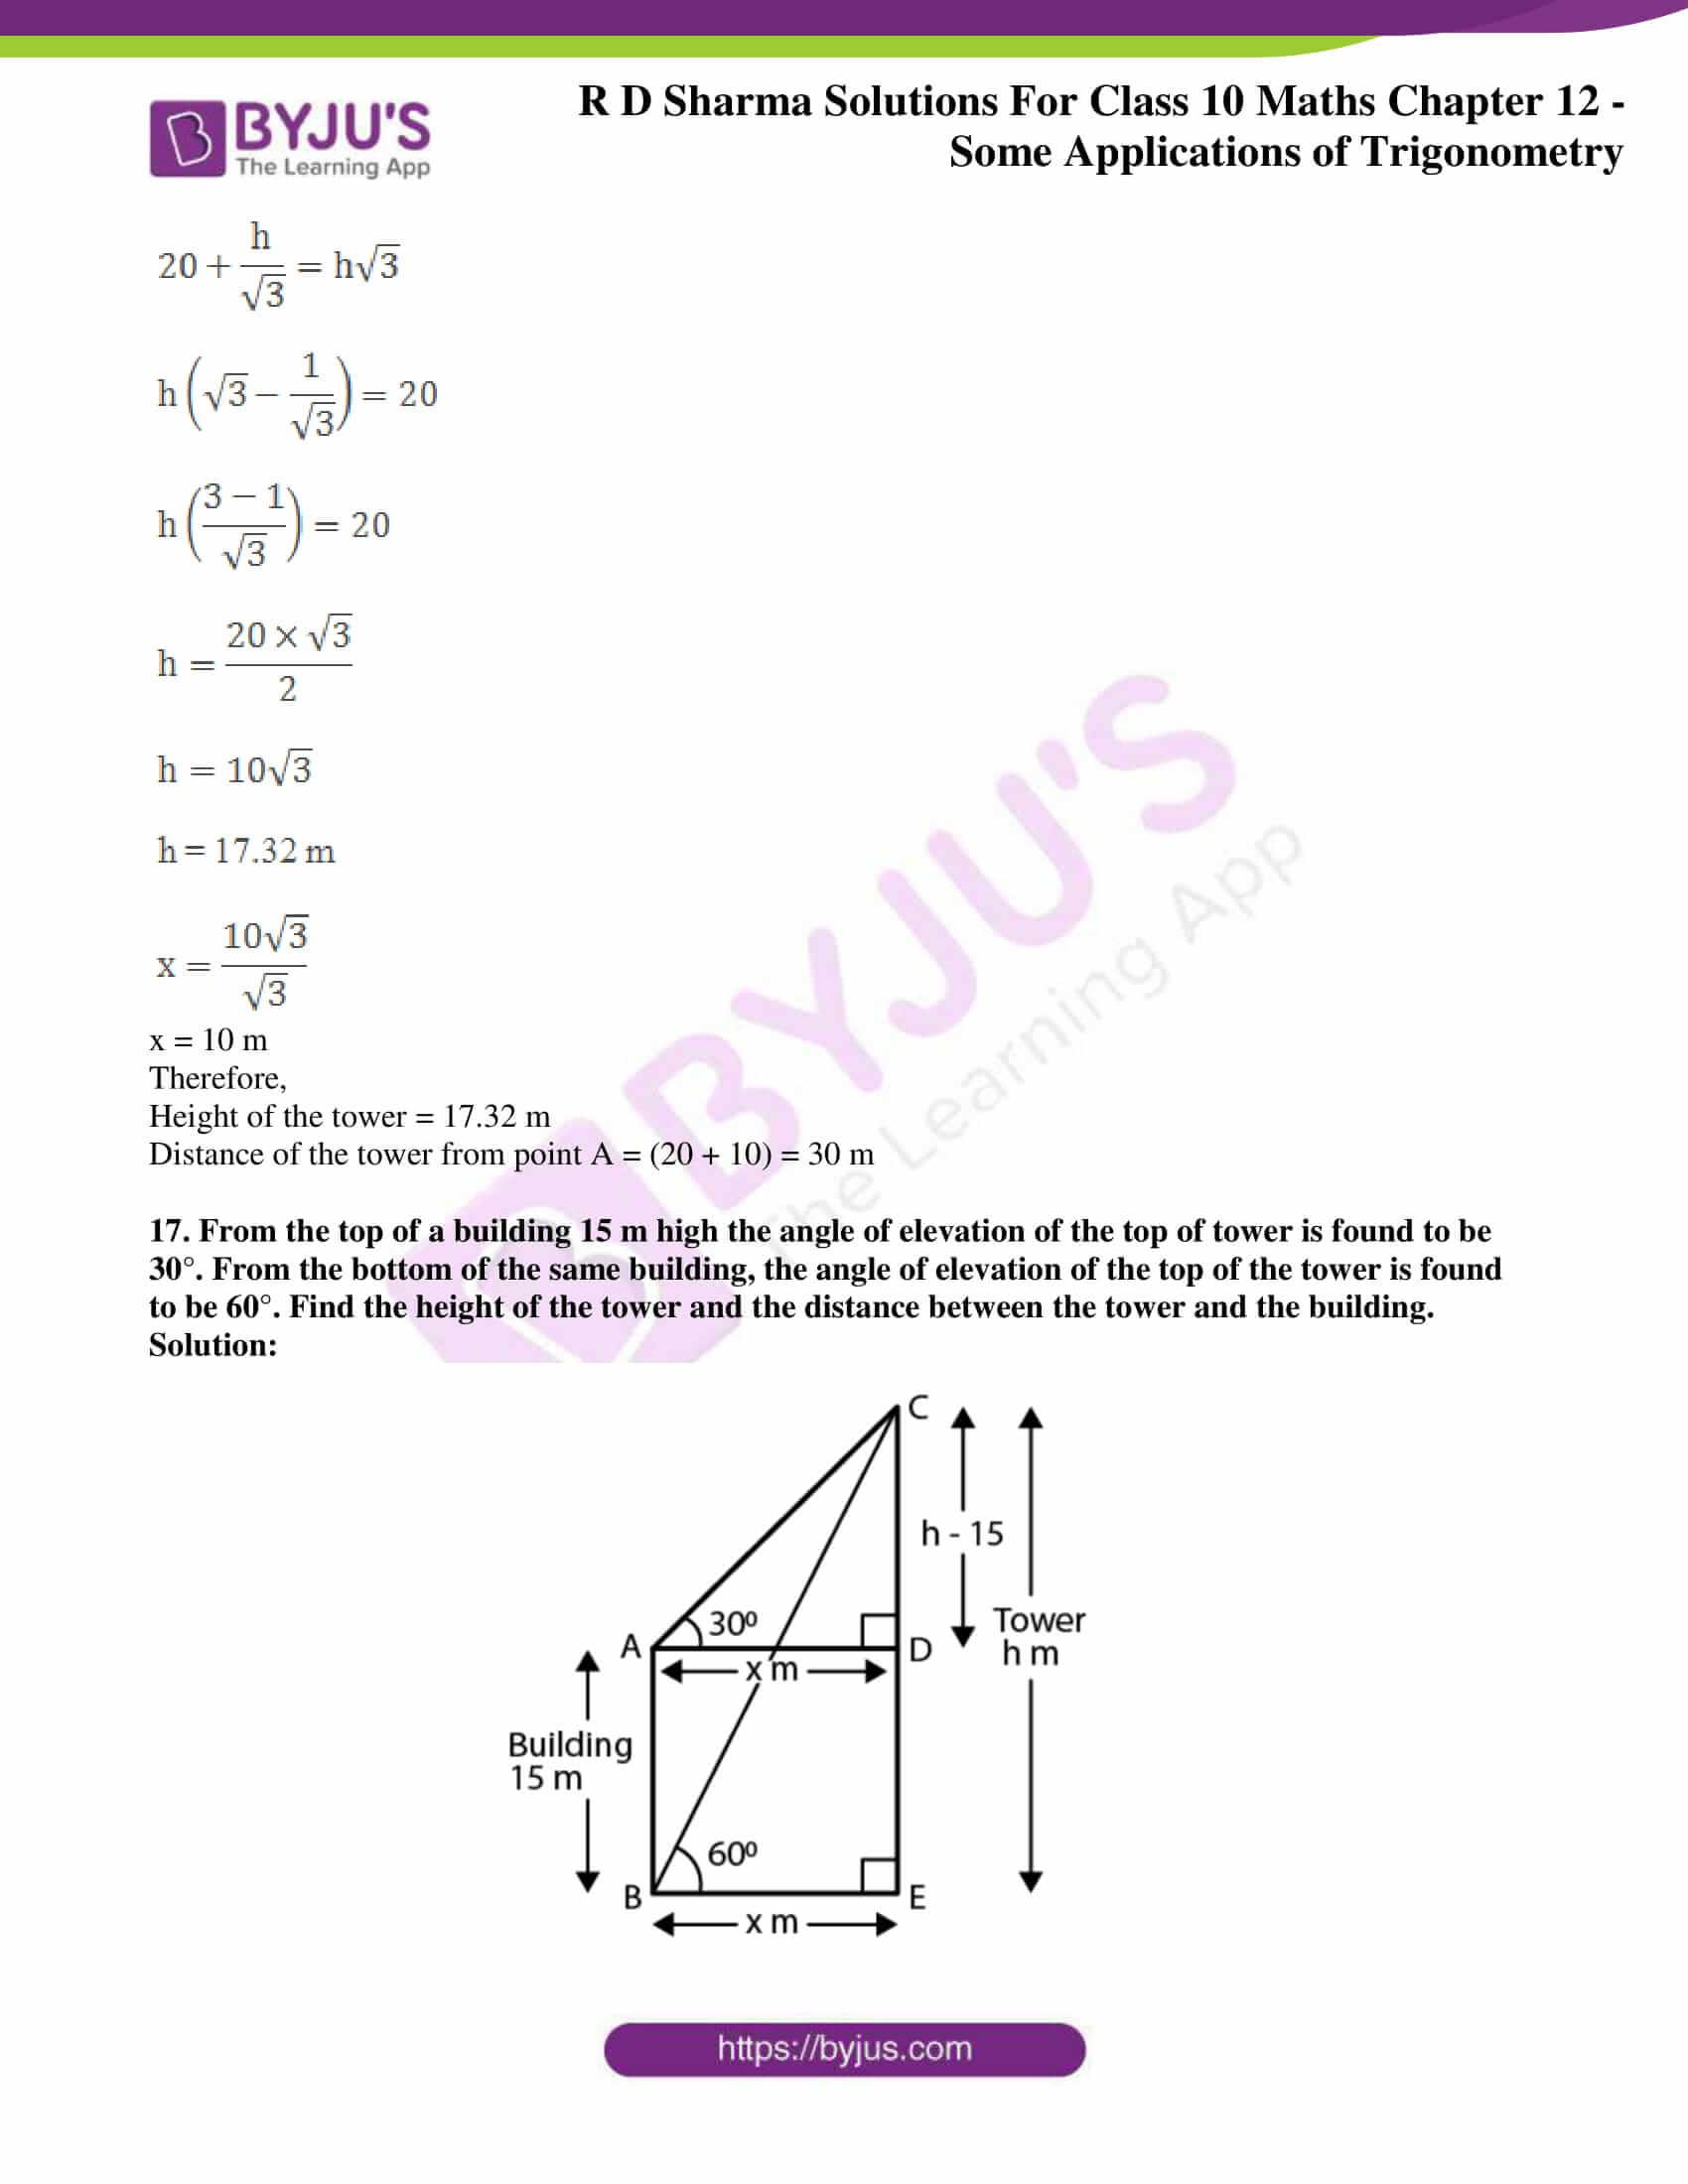 rd sharma class 10 chapter 12 applications trigonometry solutions 16